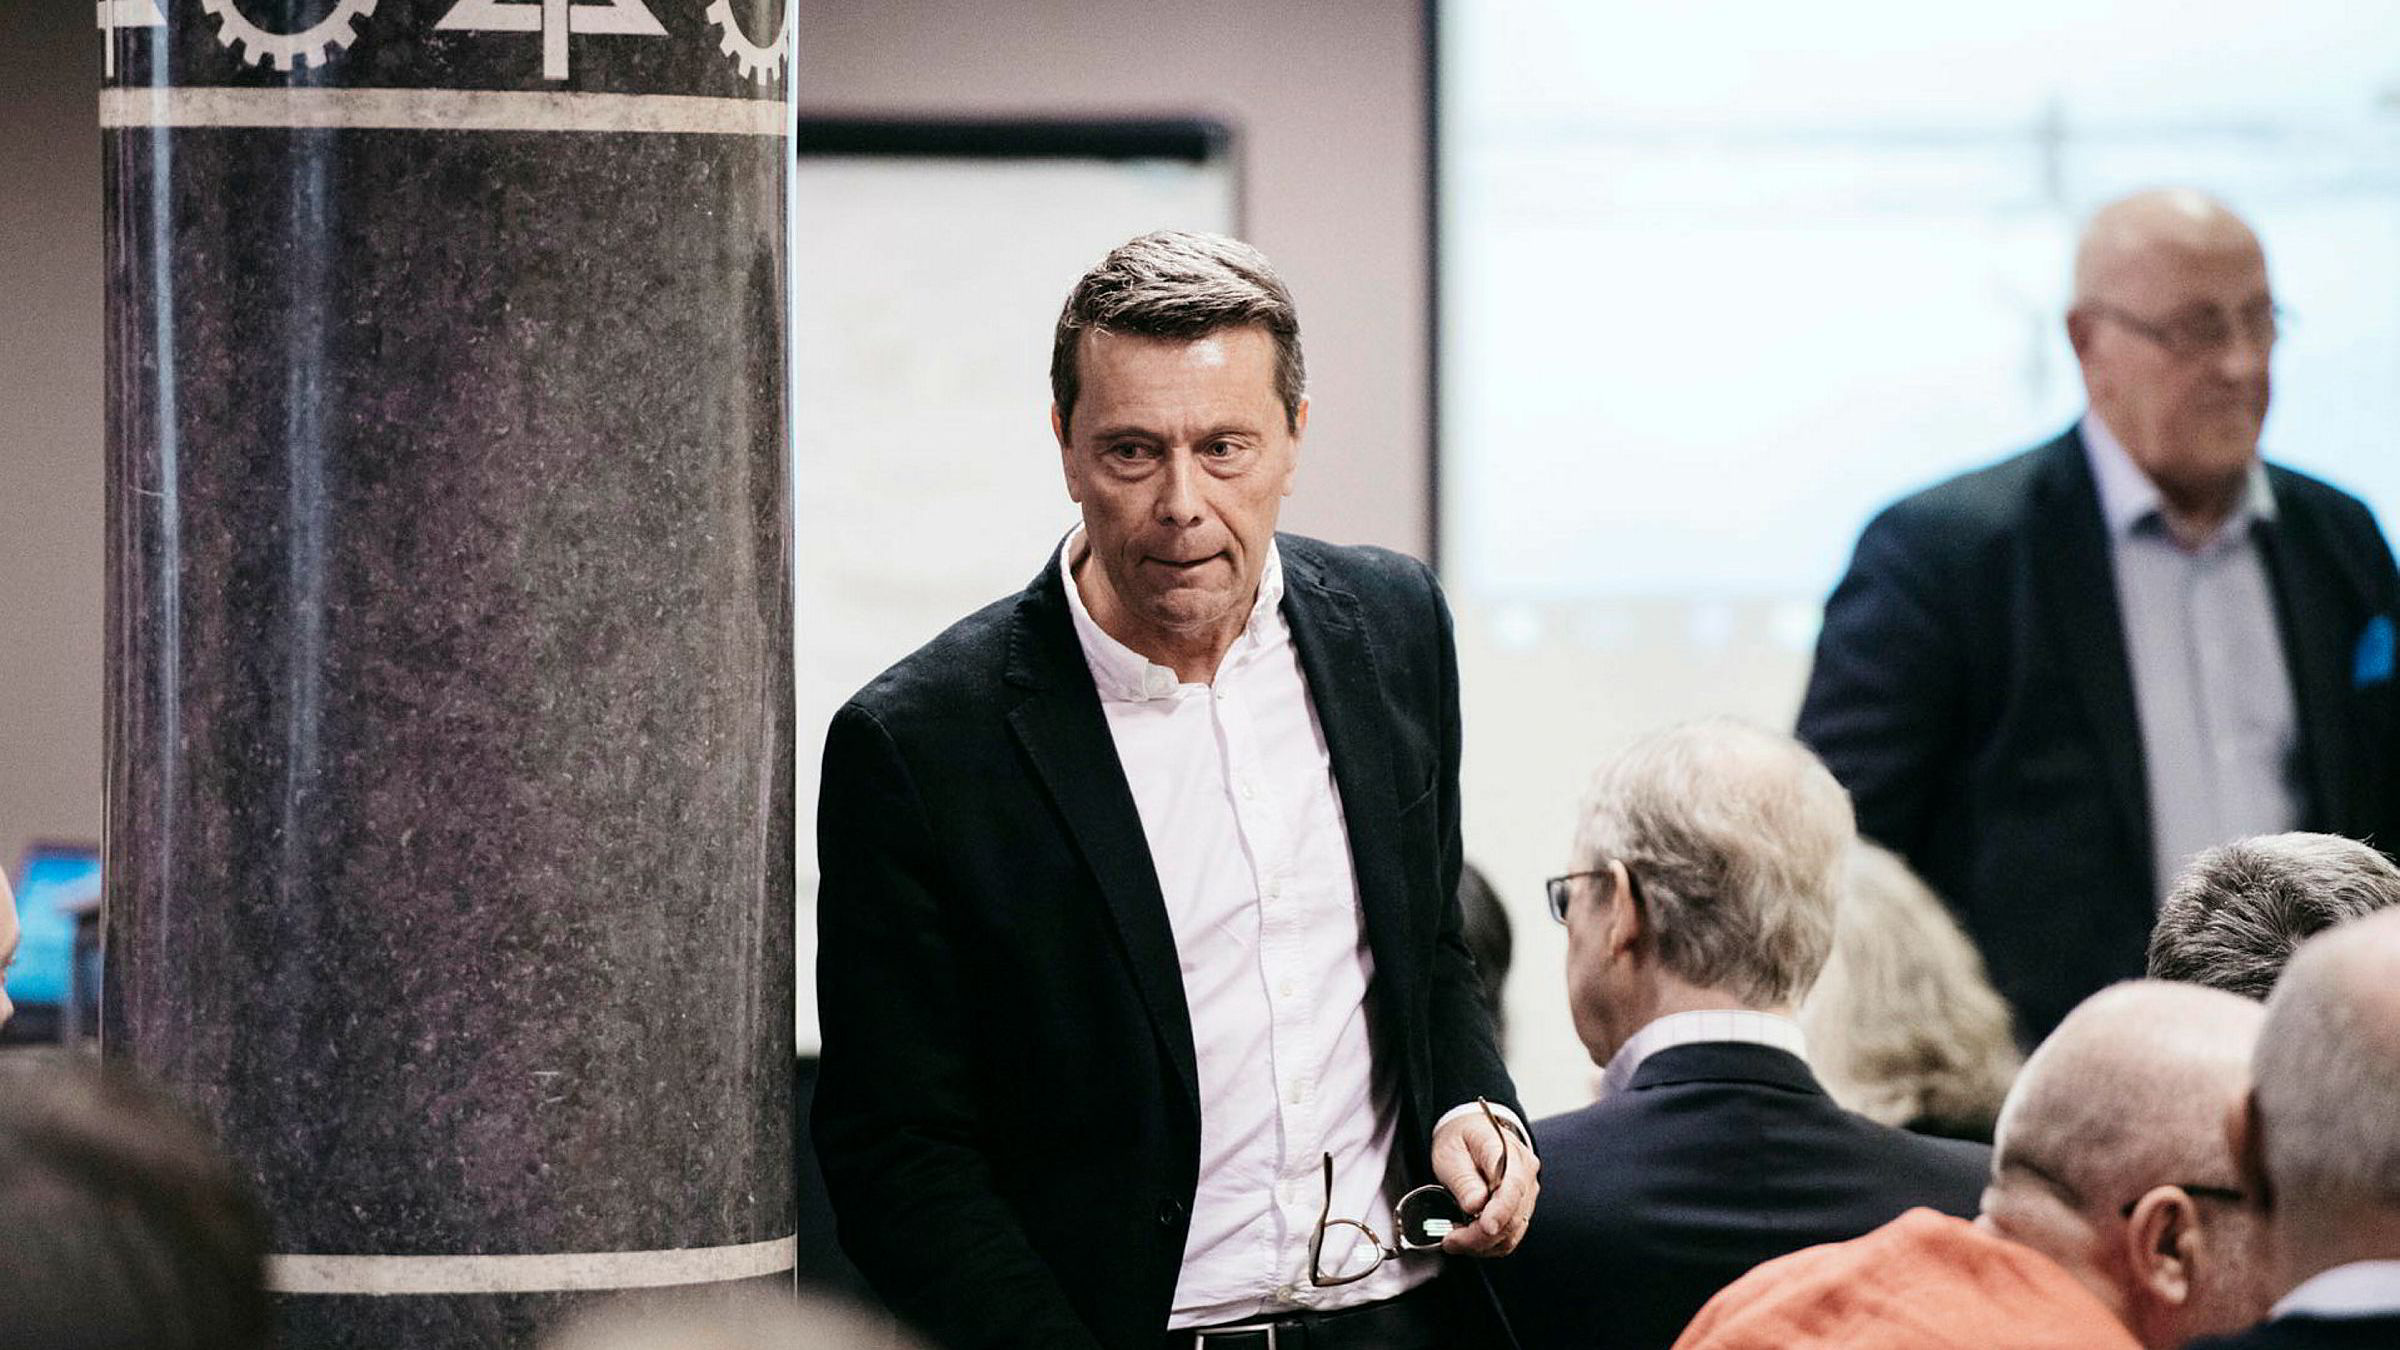 Mandag kl 15 startet den ekstraordinære generalforsamlingen i Mentor Medier der Tomas Brunegård er styreleder.